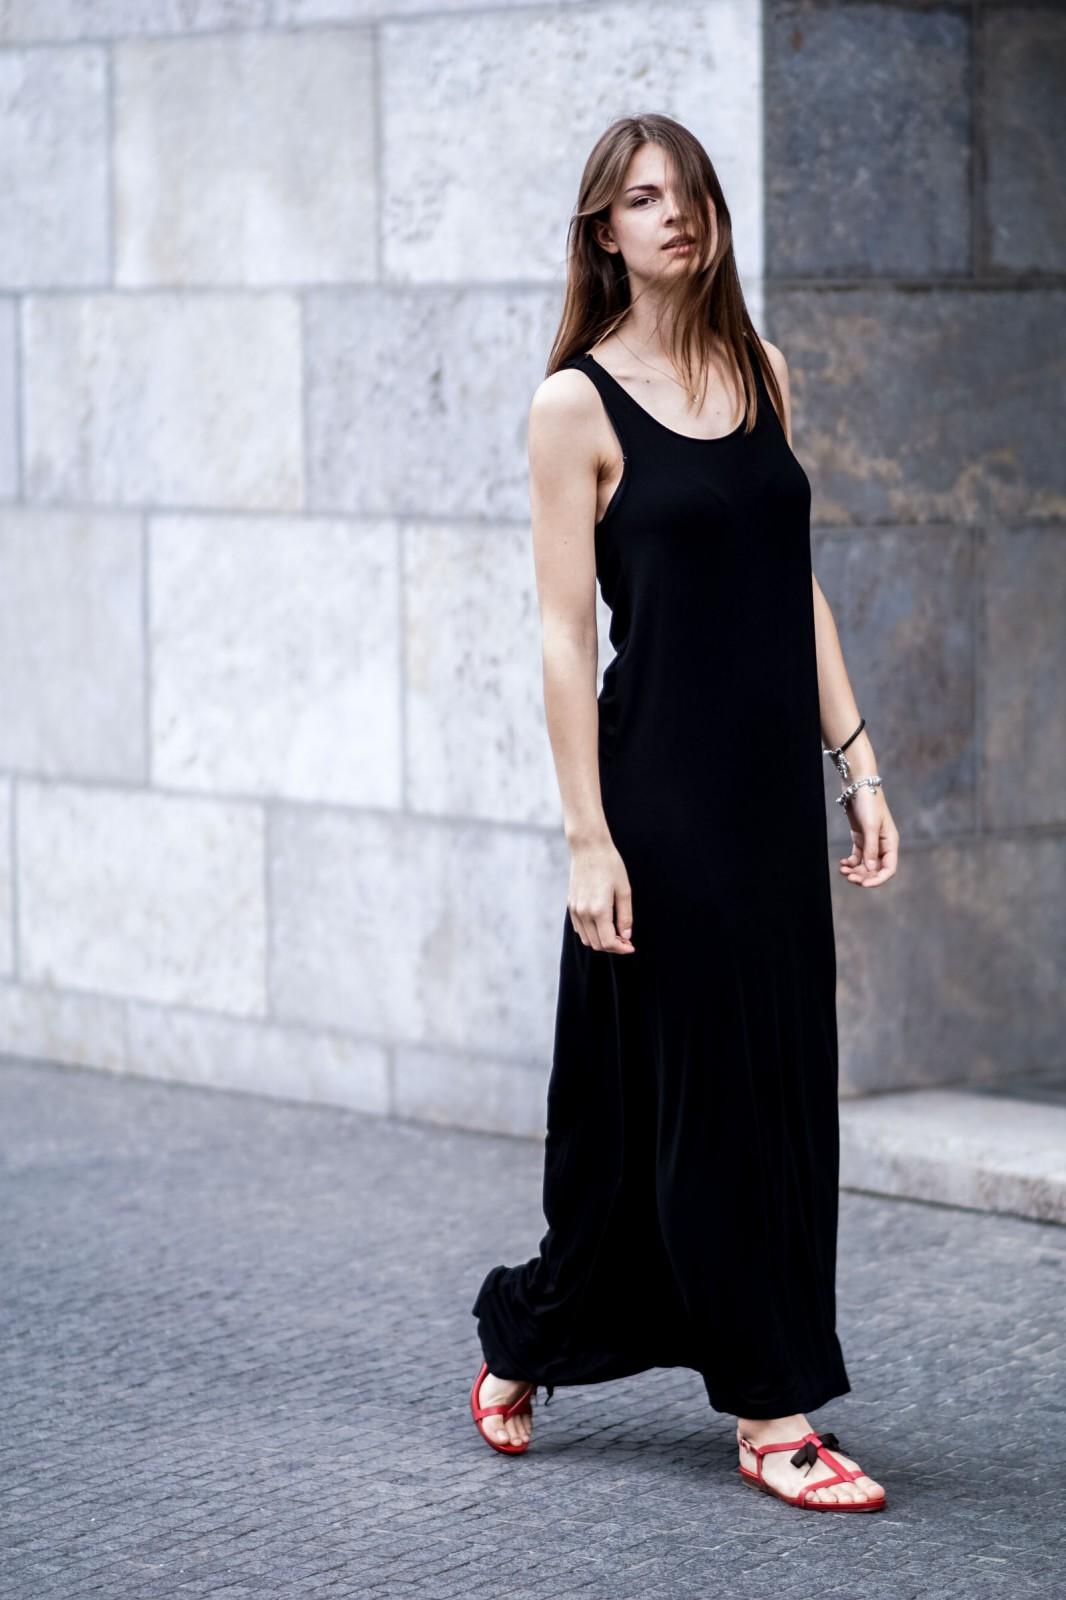 Fashionblog berlin black maxi dress